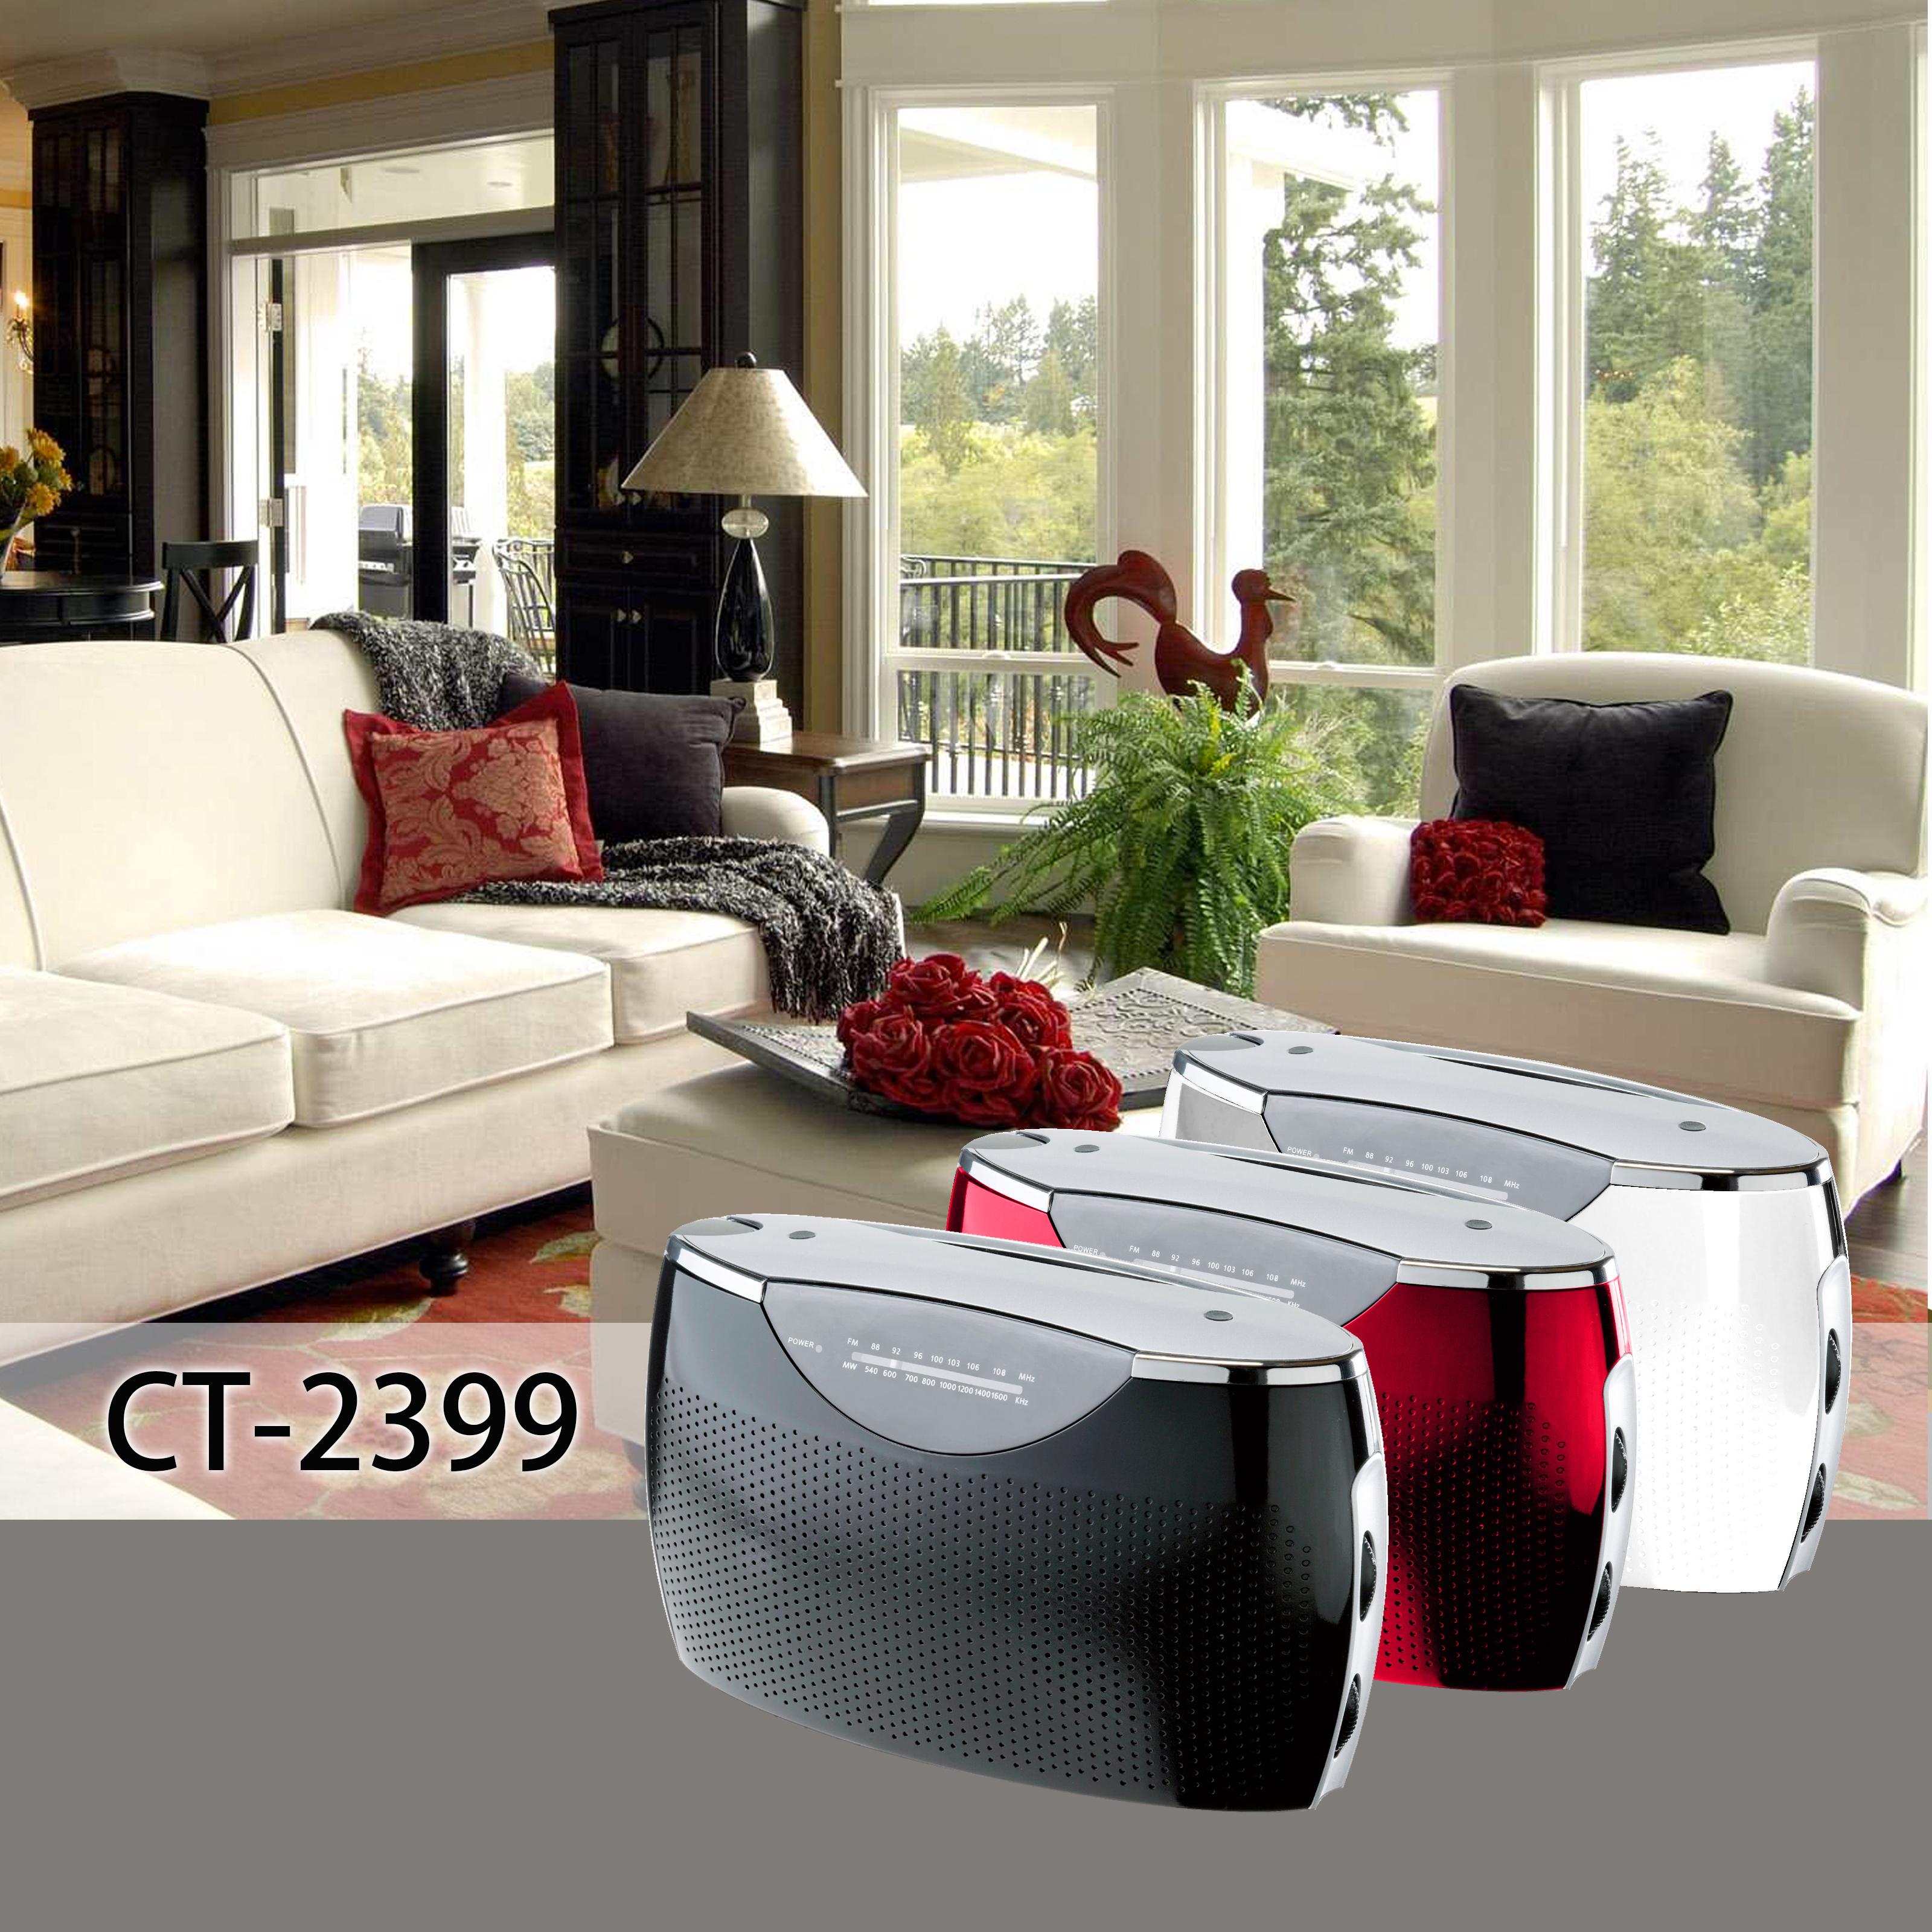 CT-2399 Livingroom  .jpg